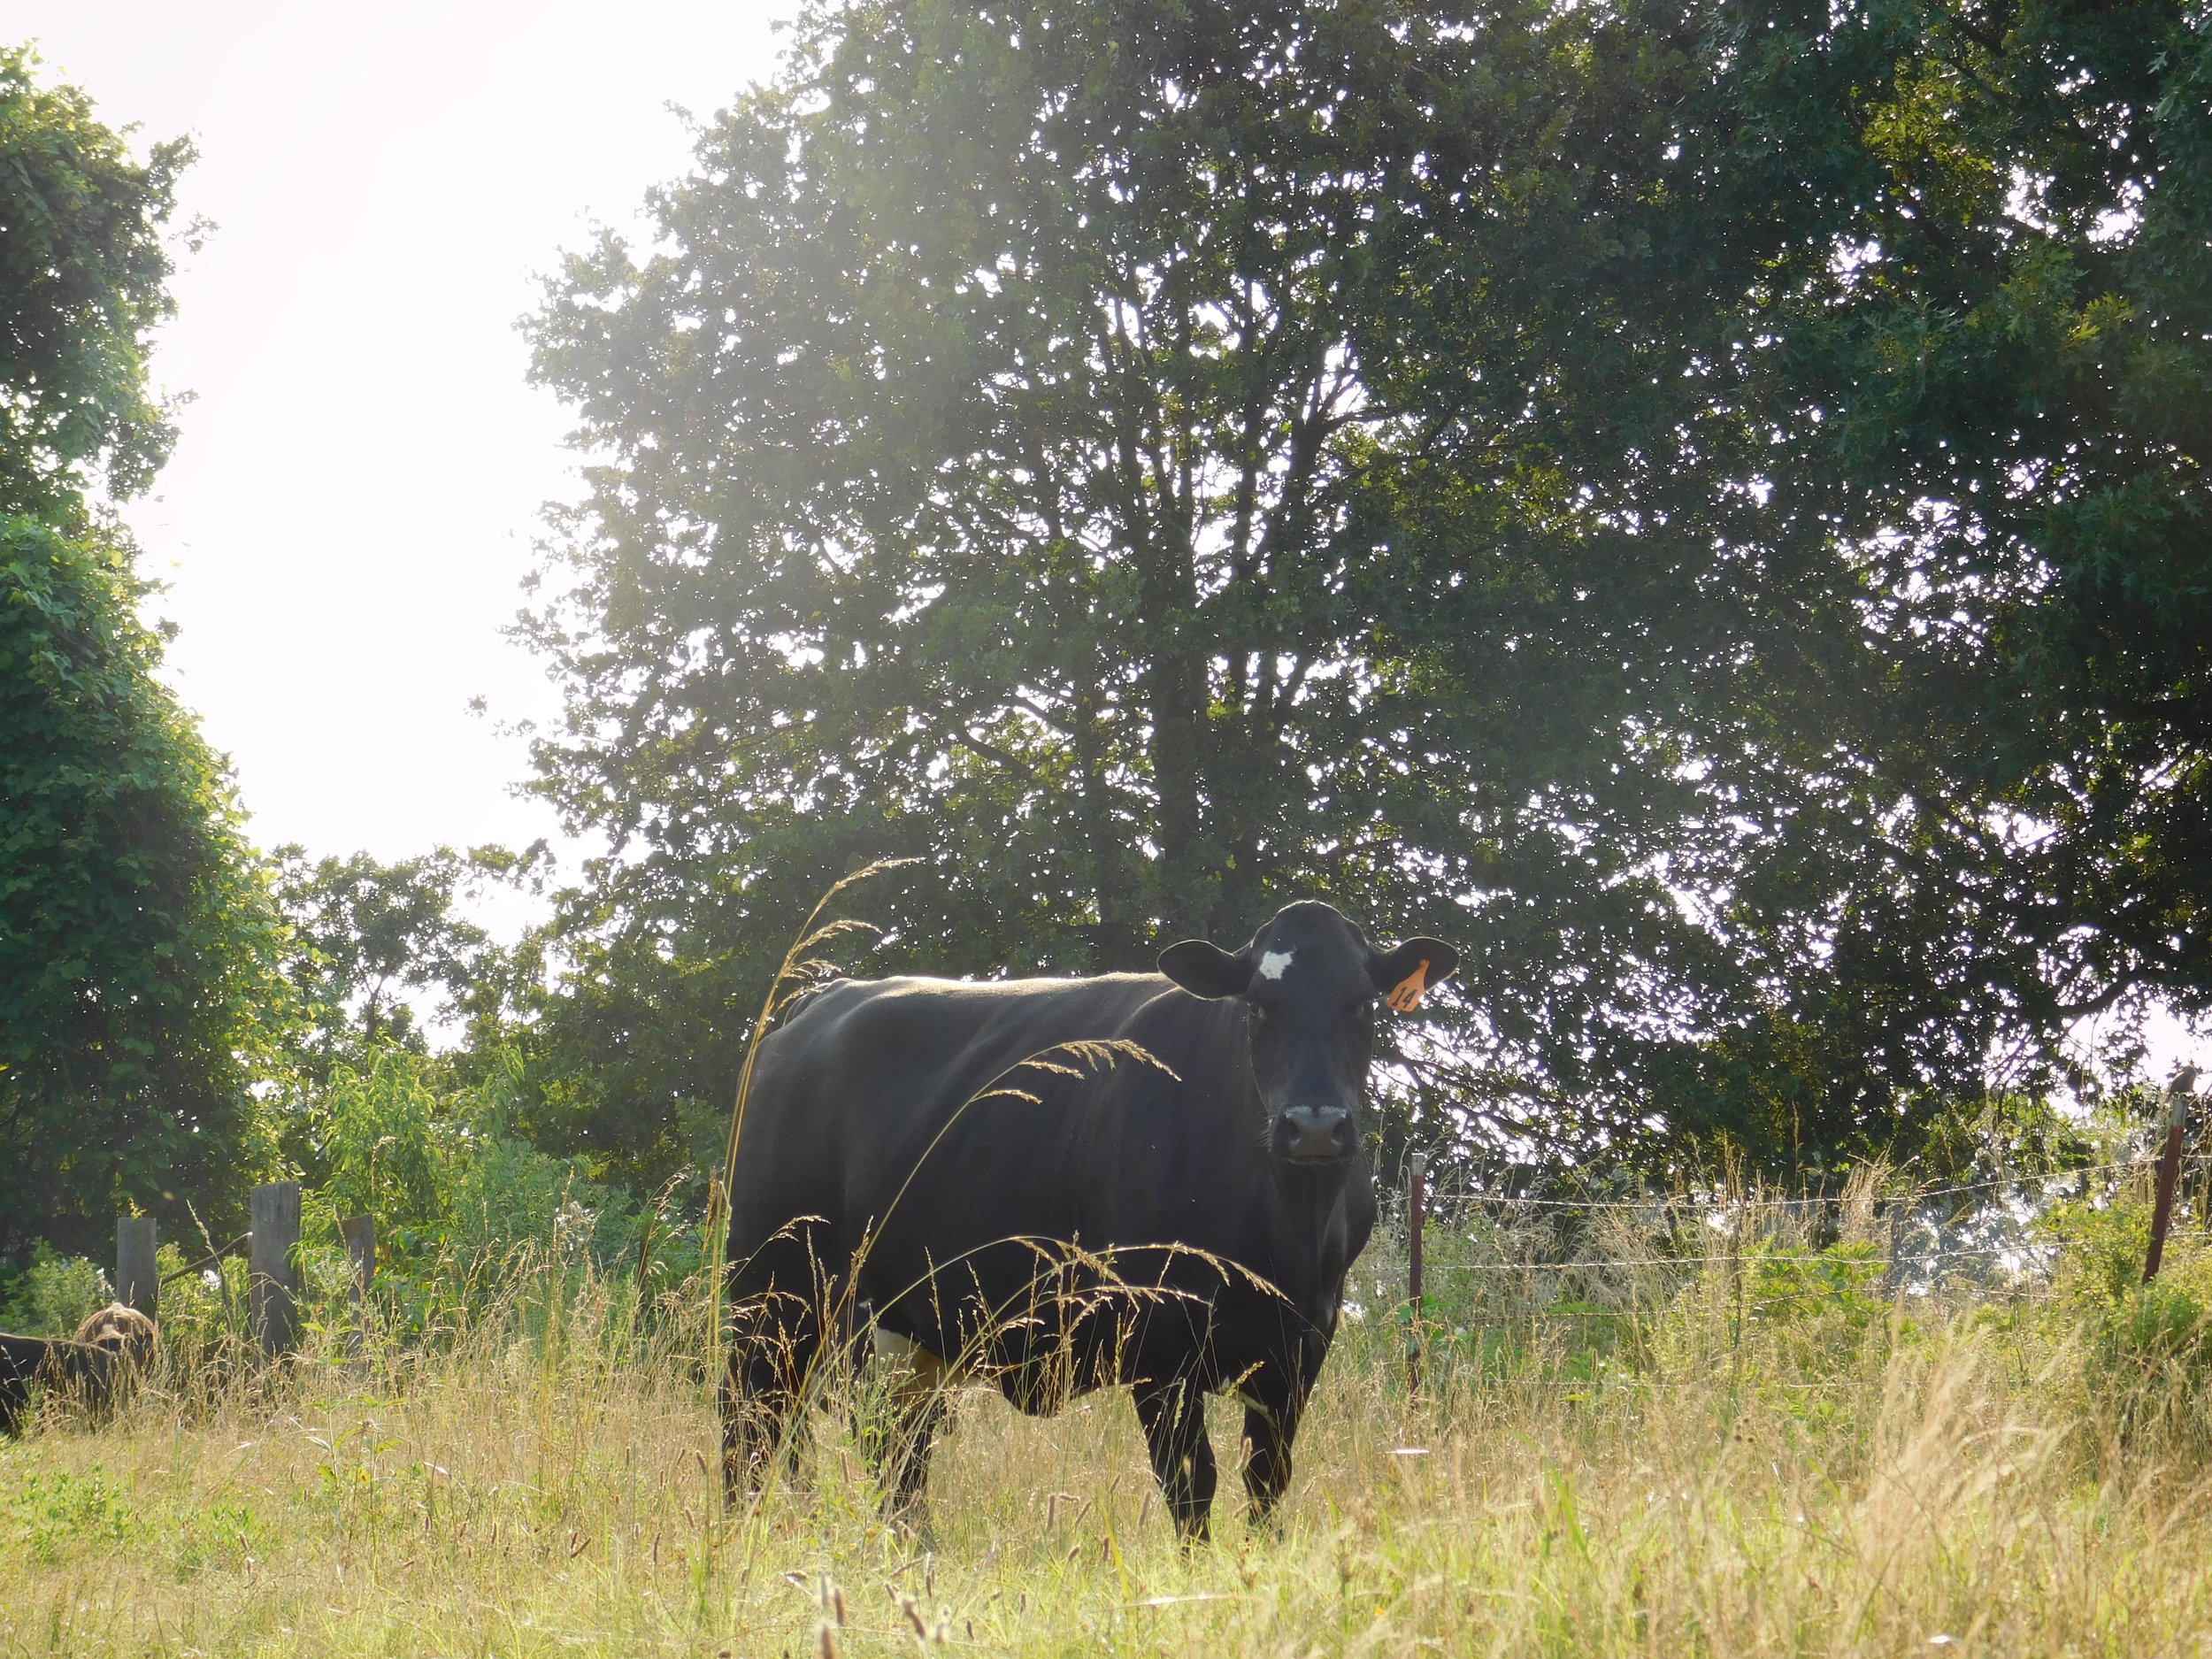 cows-032.jpg